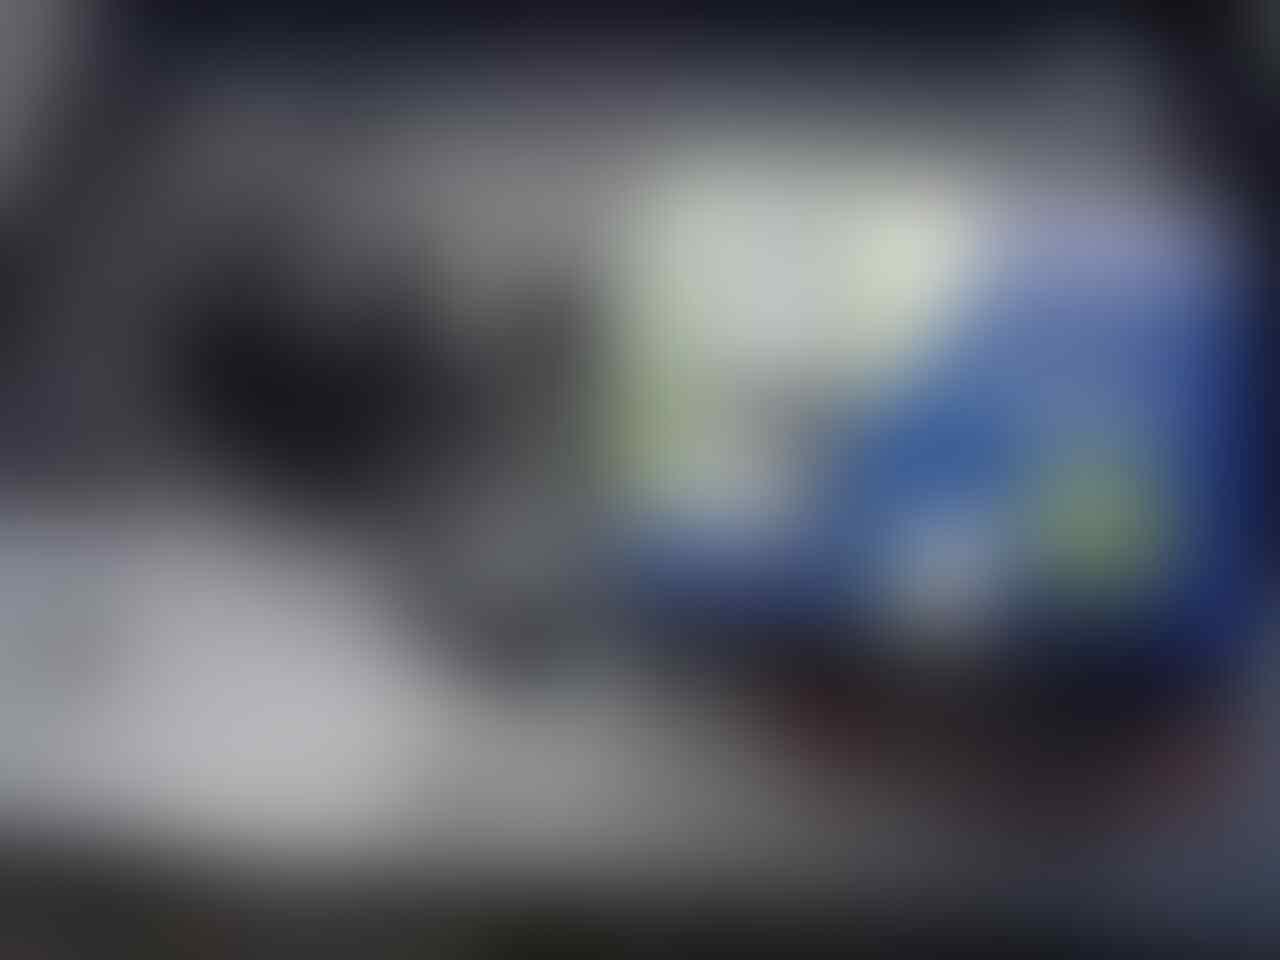 jual/tt Nokia 2730 clasic (3g,2MP) MALANG